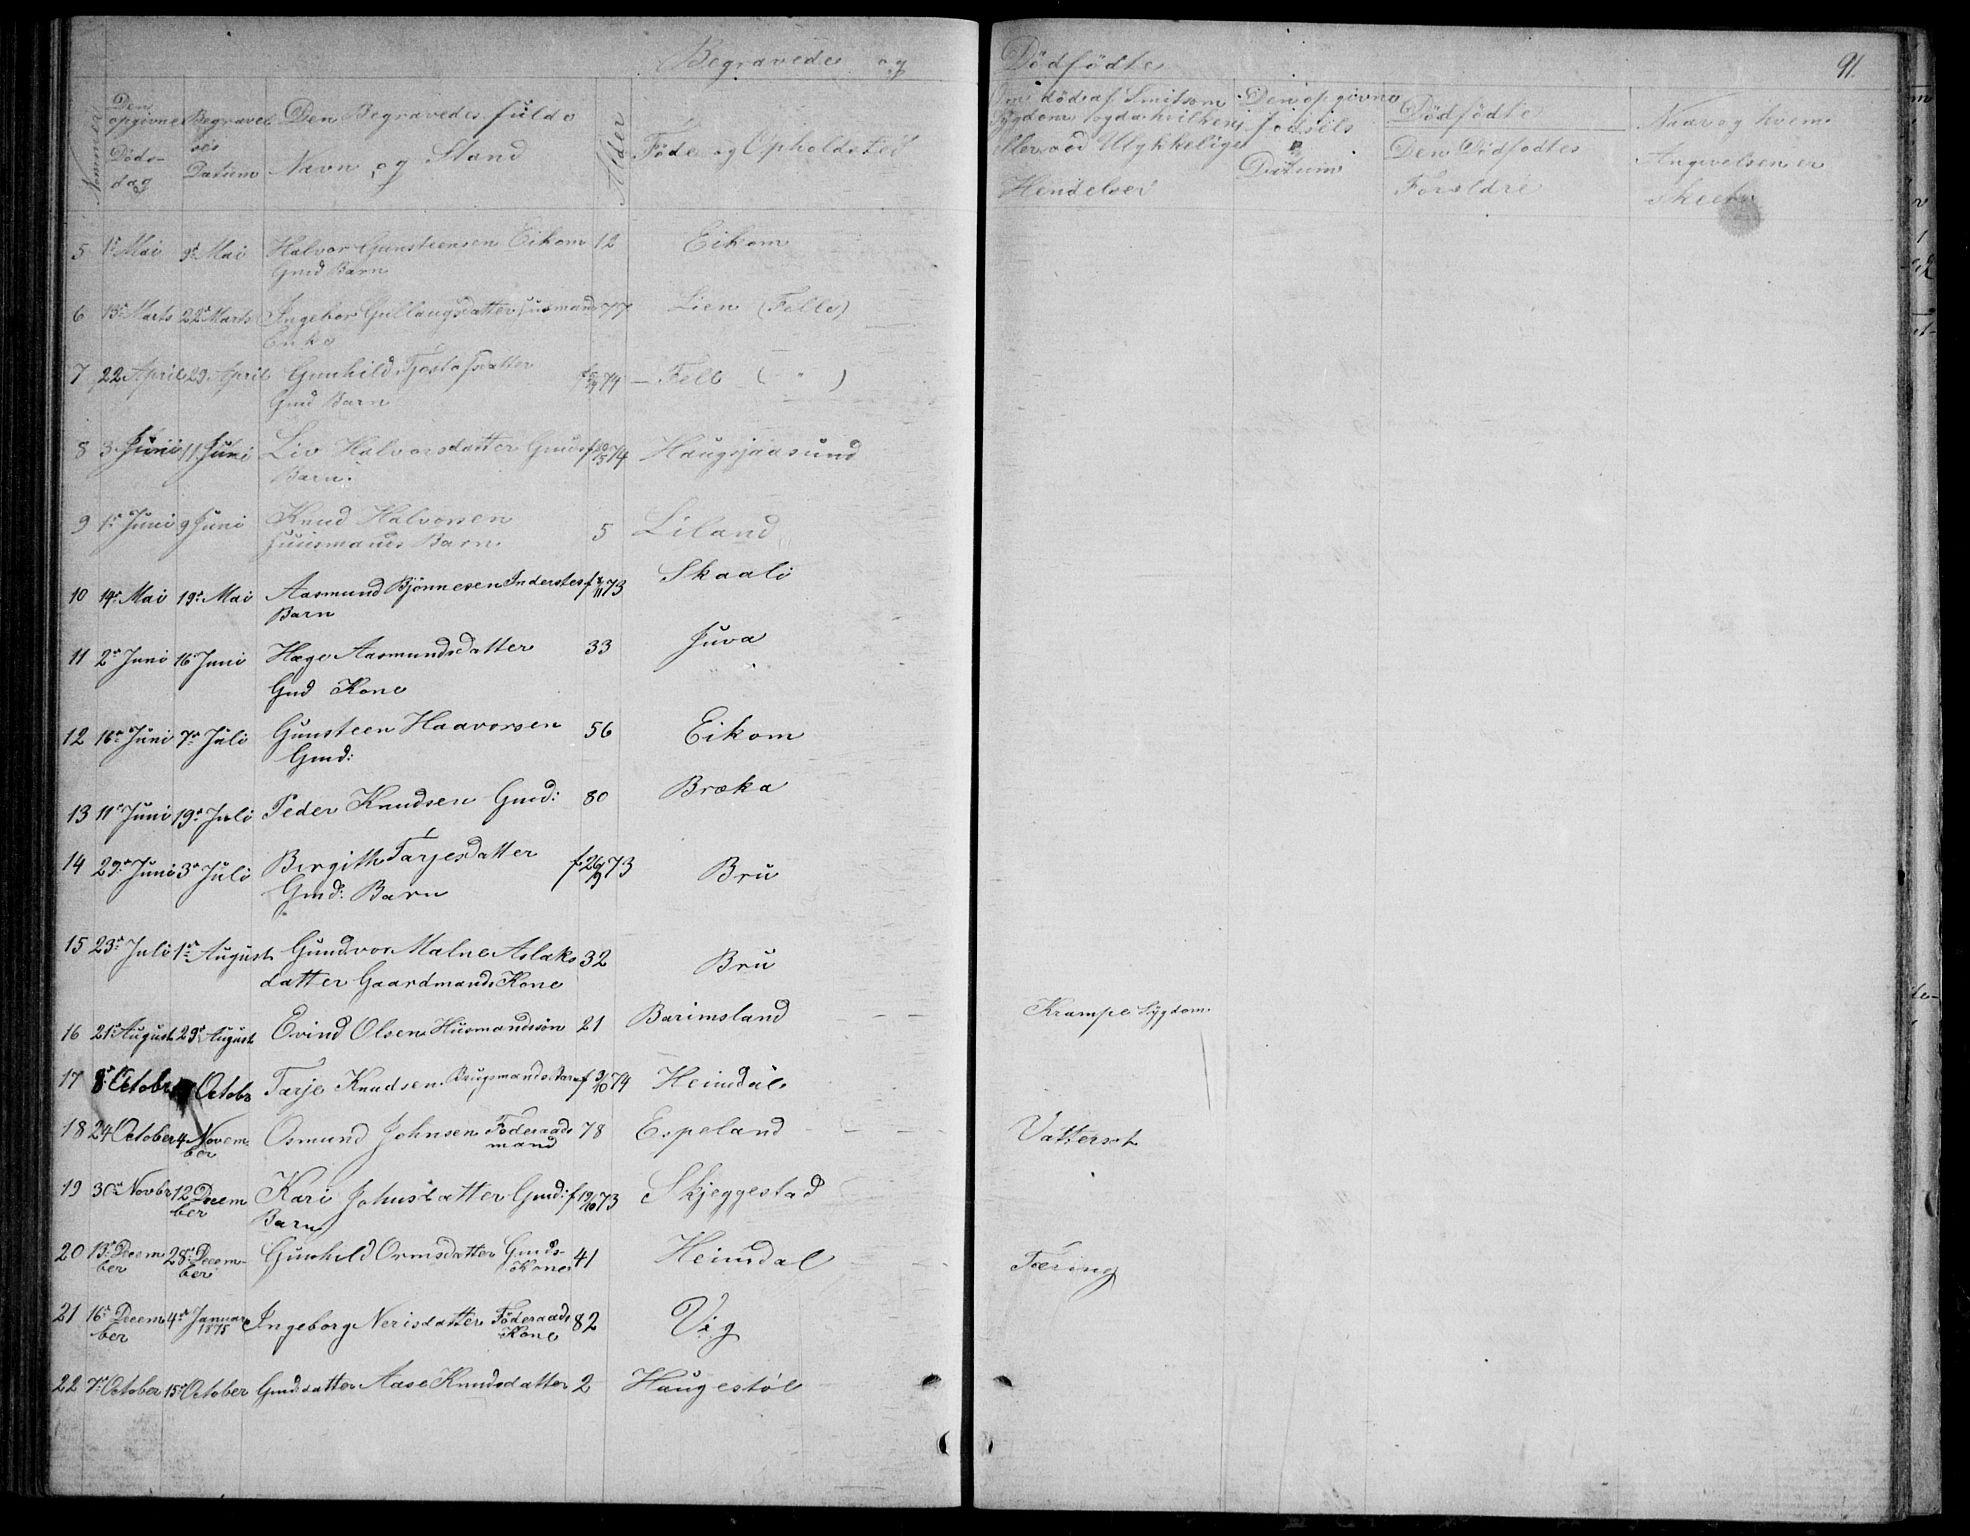 SAKO, Nissedal kirkebøker, G/Gb/L0002: Klokkerbok nr. II 2, 1863-1892, s. 91